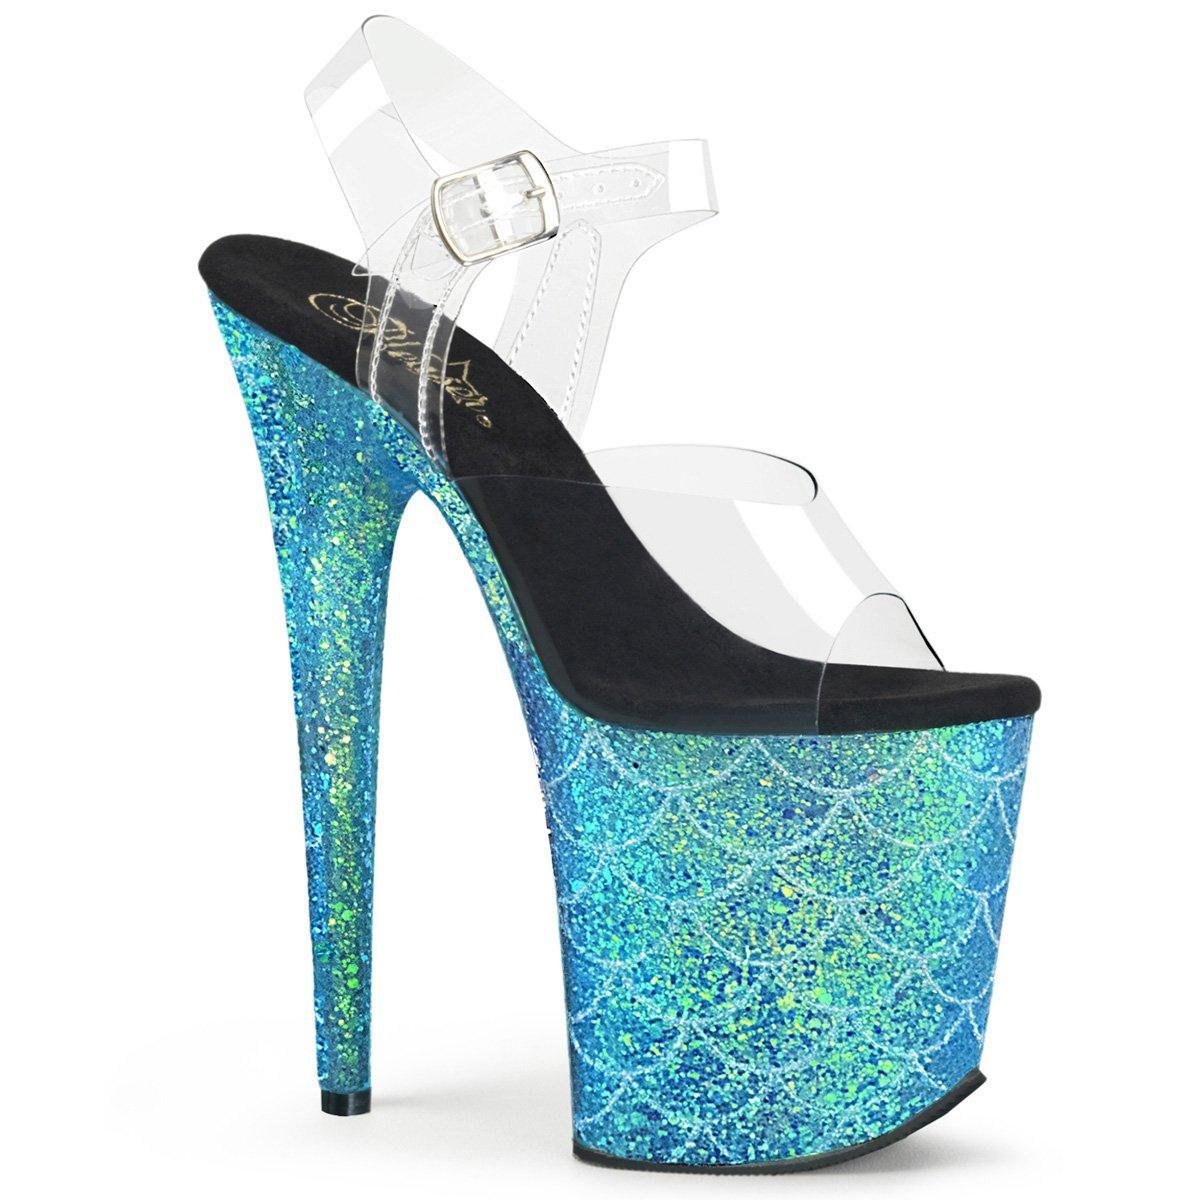 Women's Aqua Flamingo Glitter Fish Scale Design Ankle-Strap Platform Sandals - DeluxeAdultCostumes.com